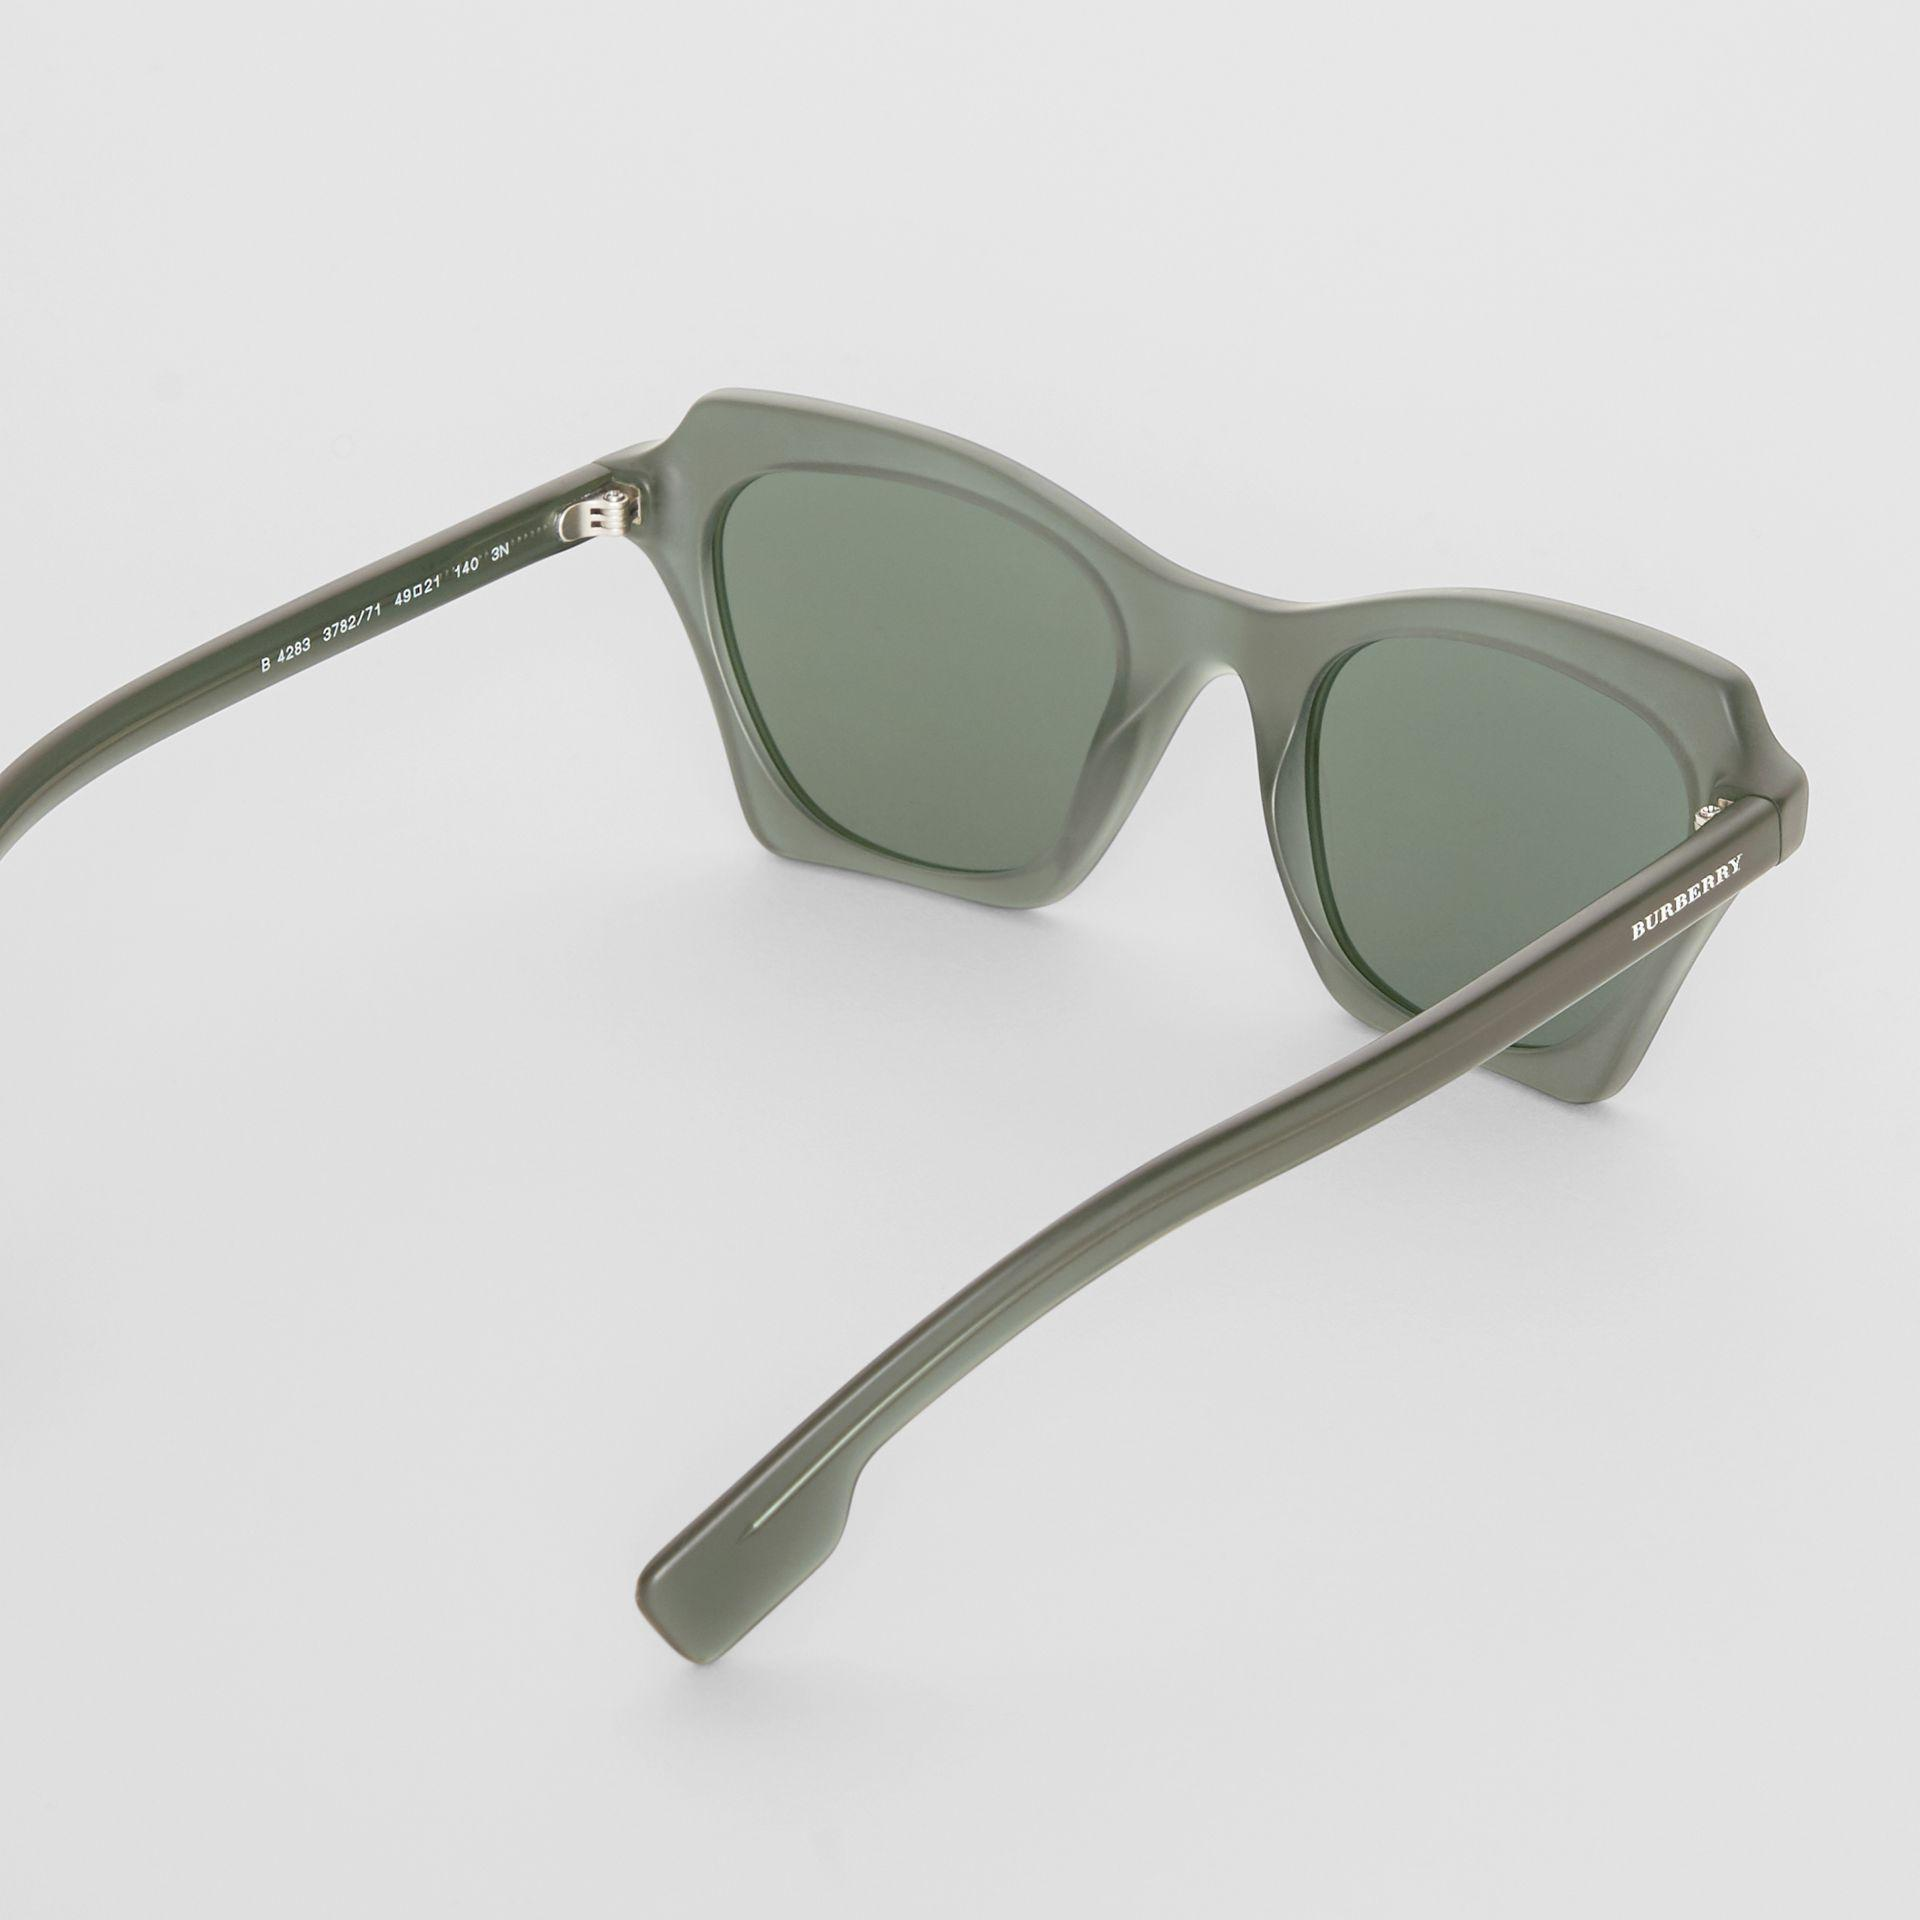 3eb9ea1ac319 Burberry - Green Butterfly Frame Sunglasses - Lyst. View fullscreen